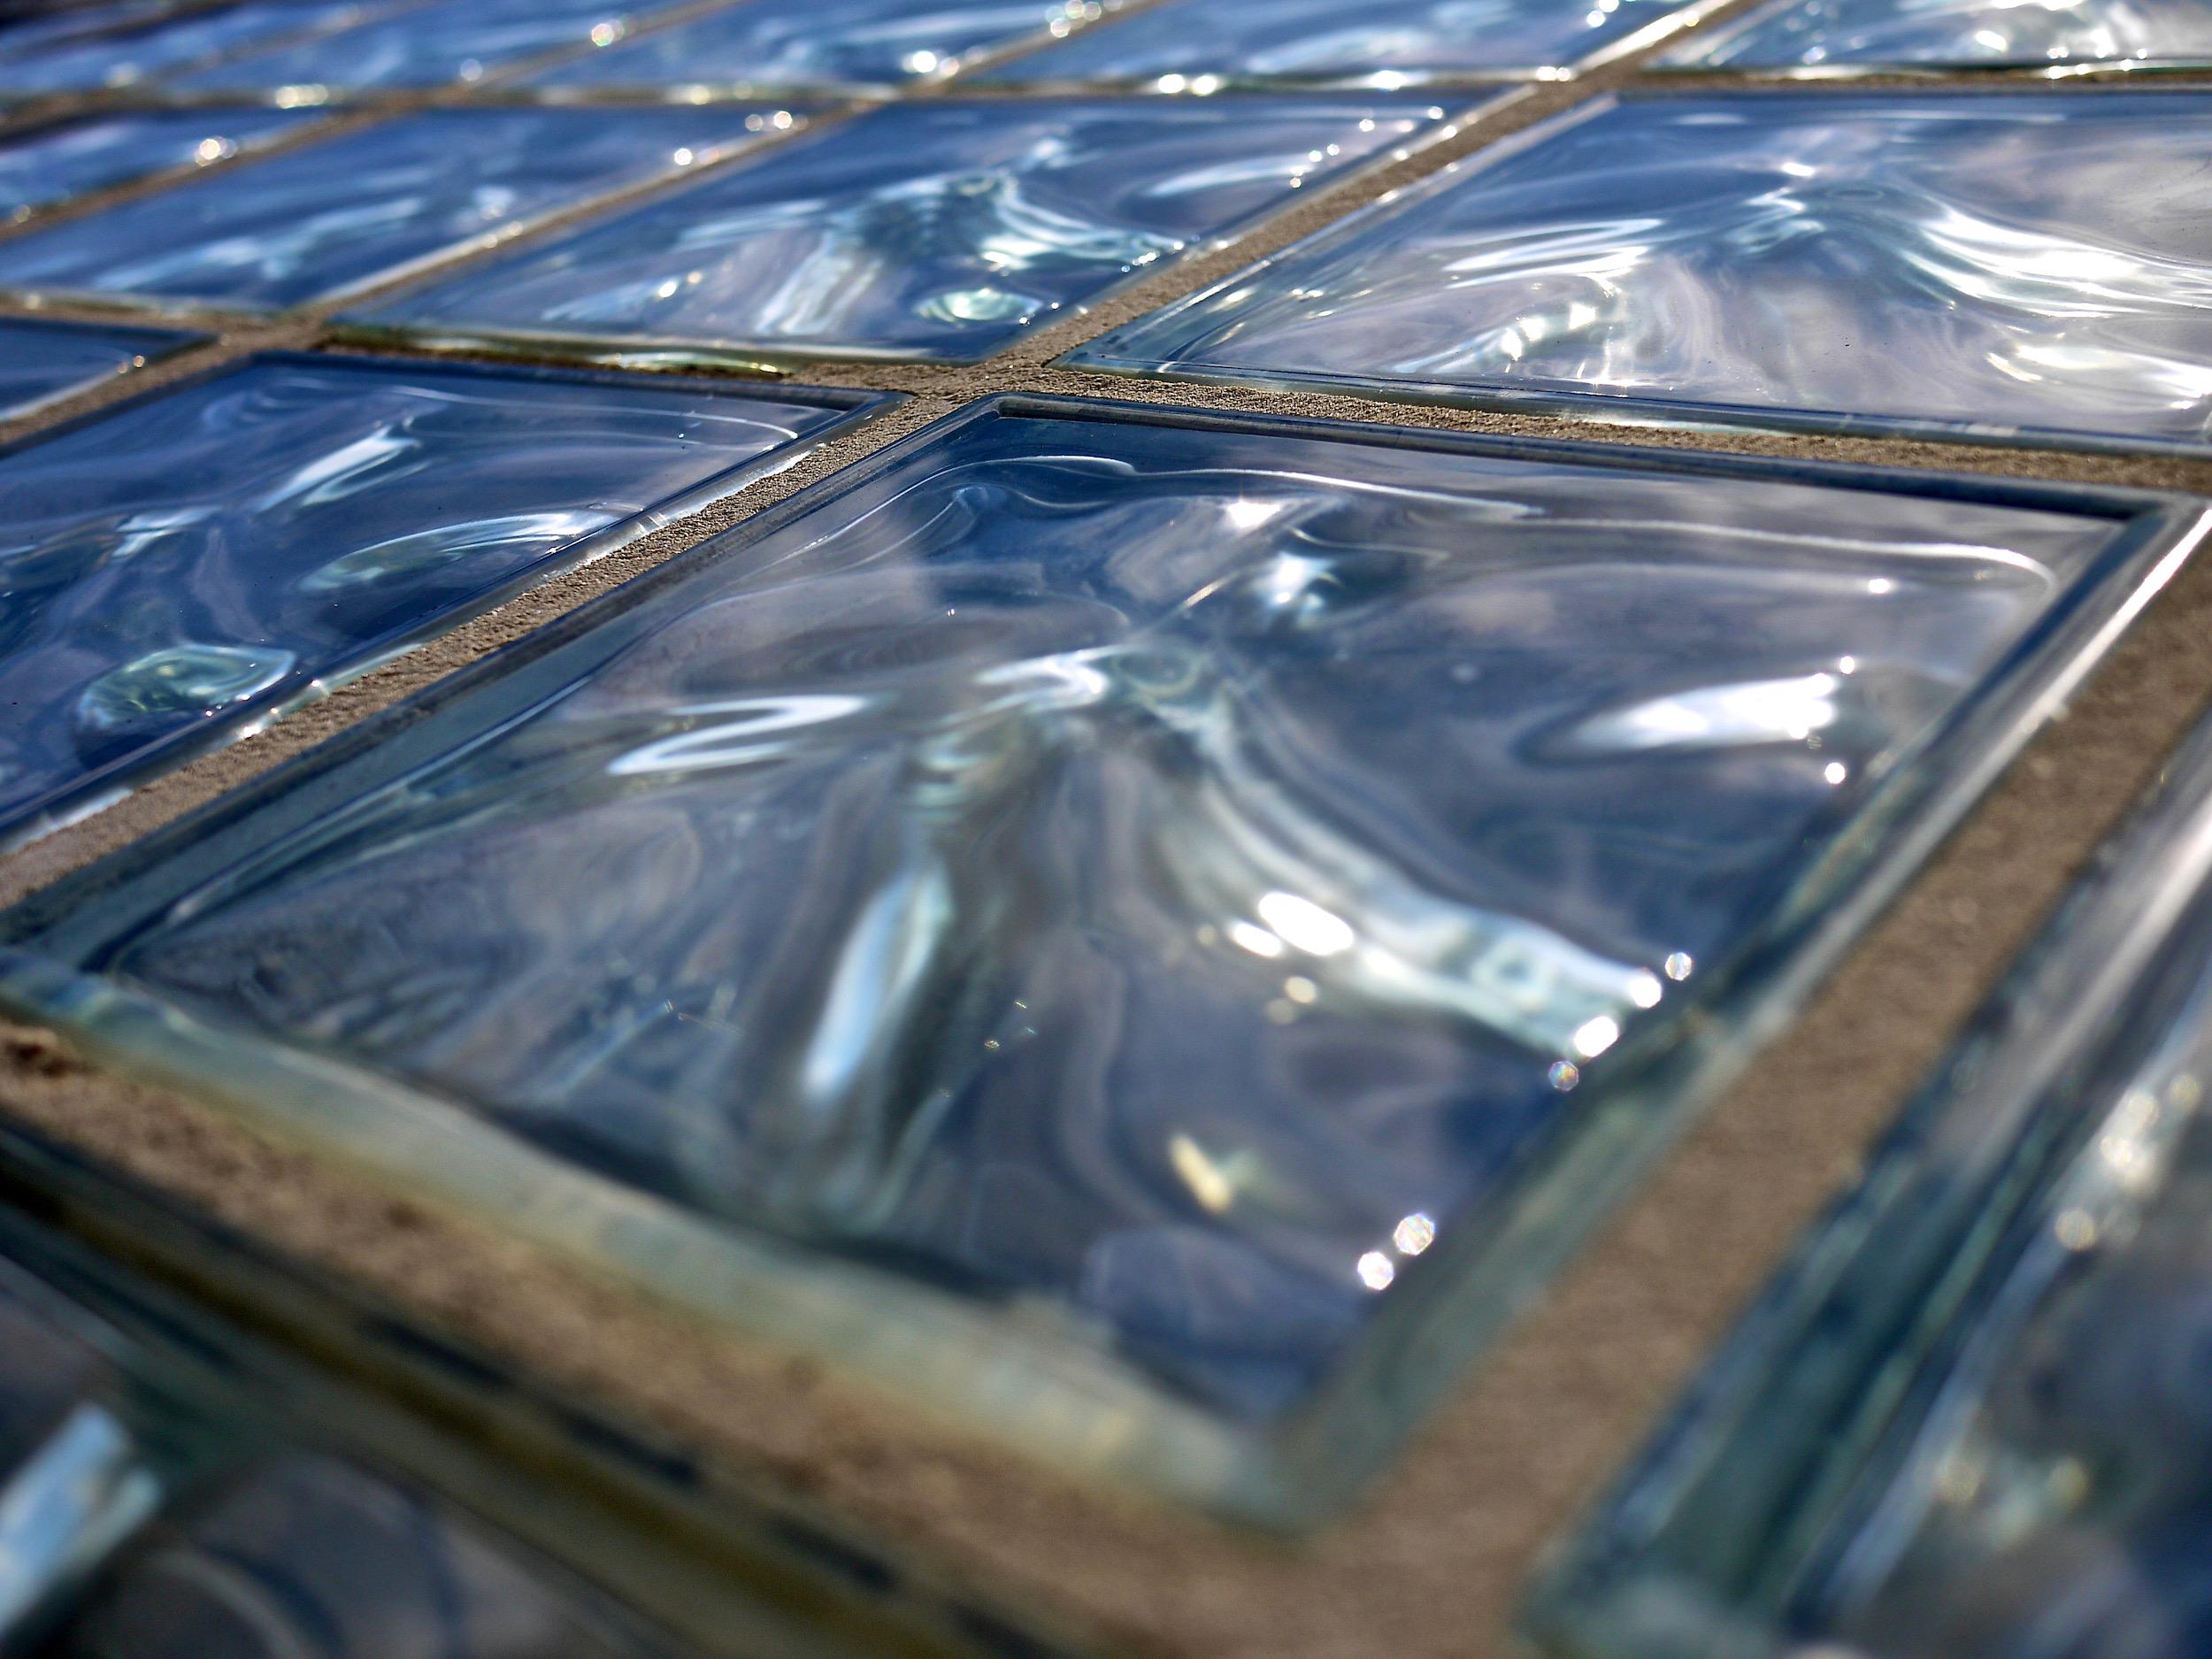 Close up angle on a glass brick wall.